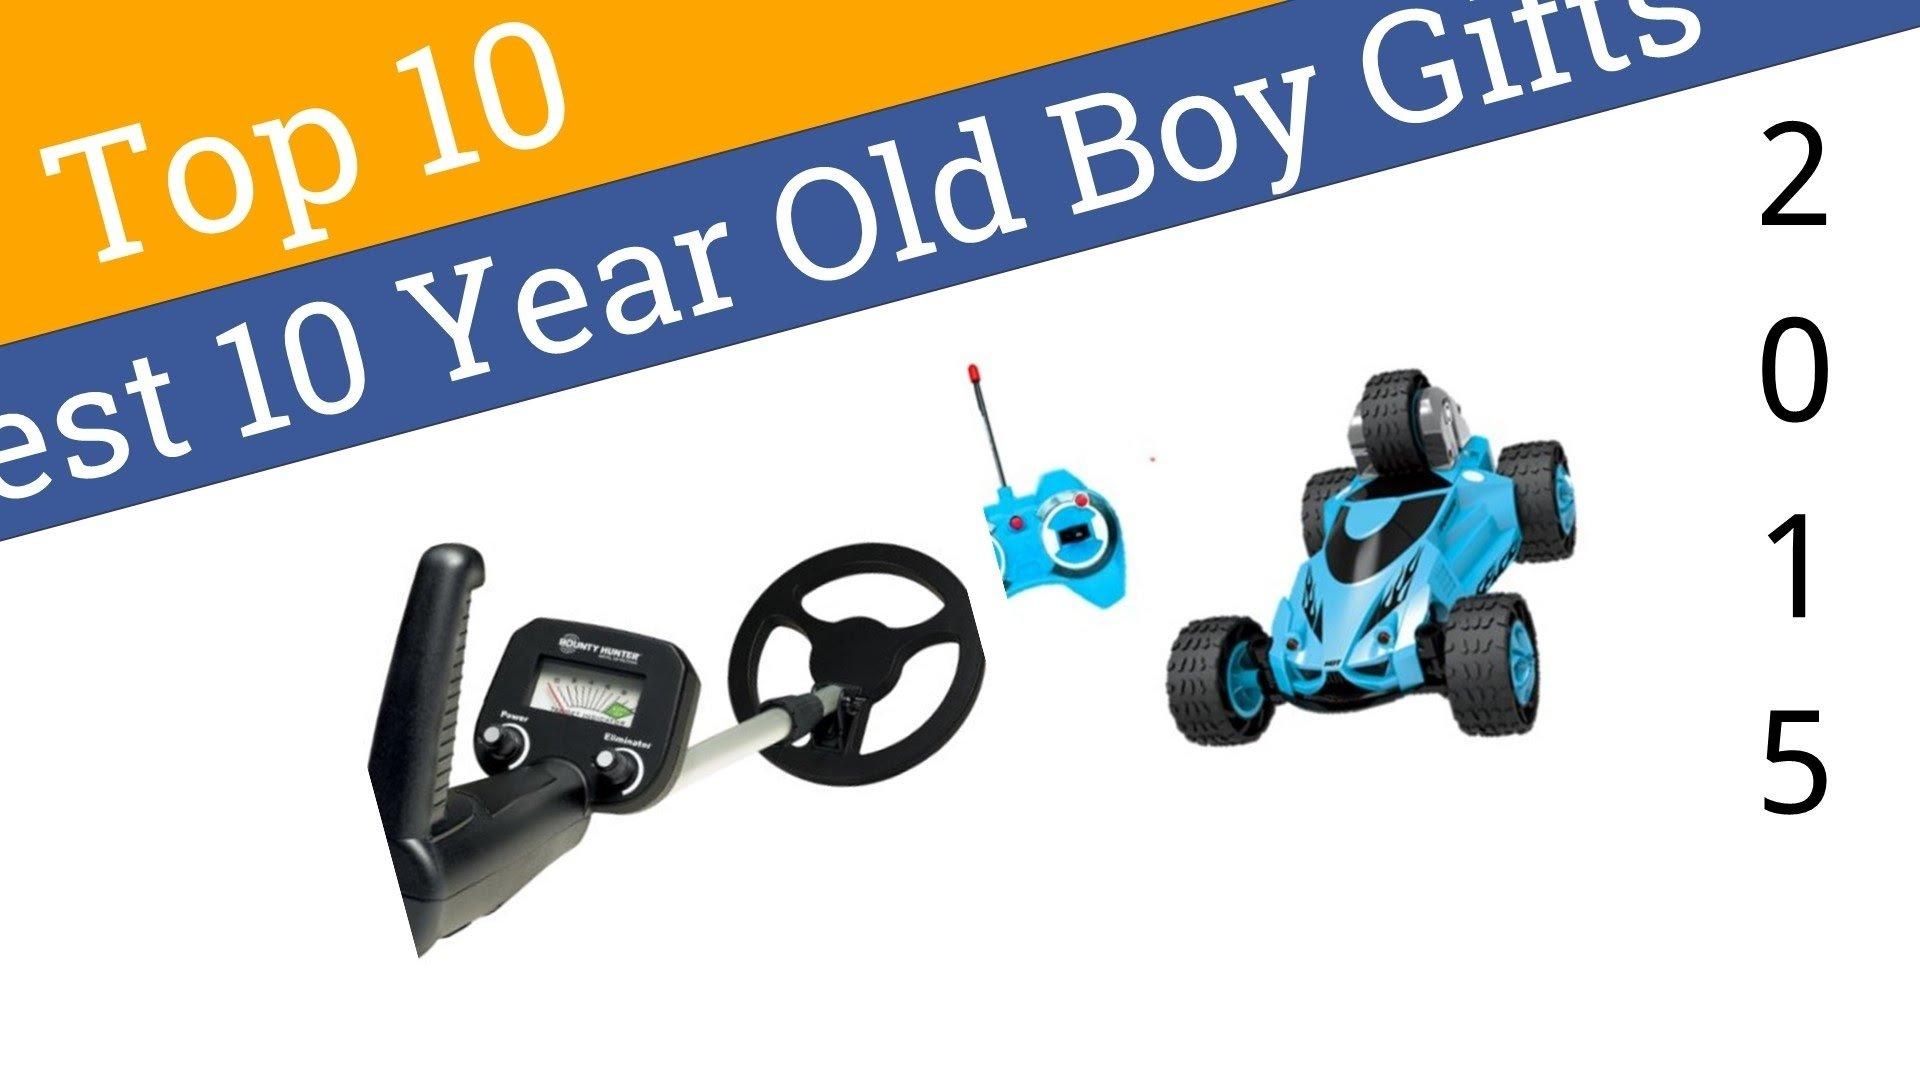 10 Elegant Birthday Gift Ideas For 10 Year Old Boy 10 best 10 year old boy gifts 2015 youtube 4 2020